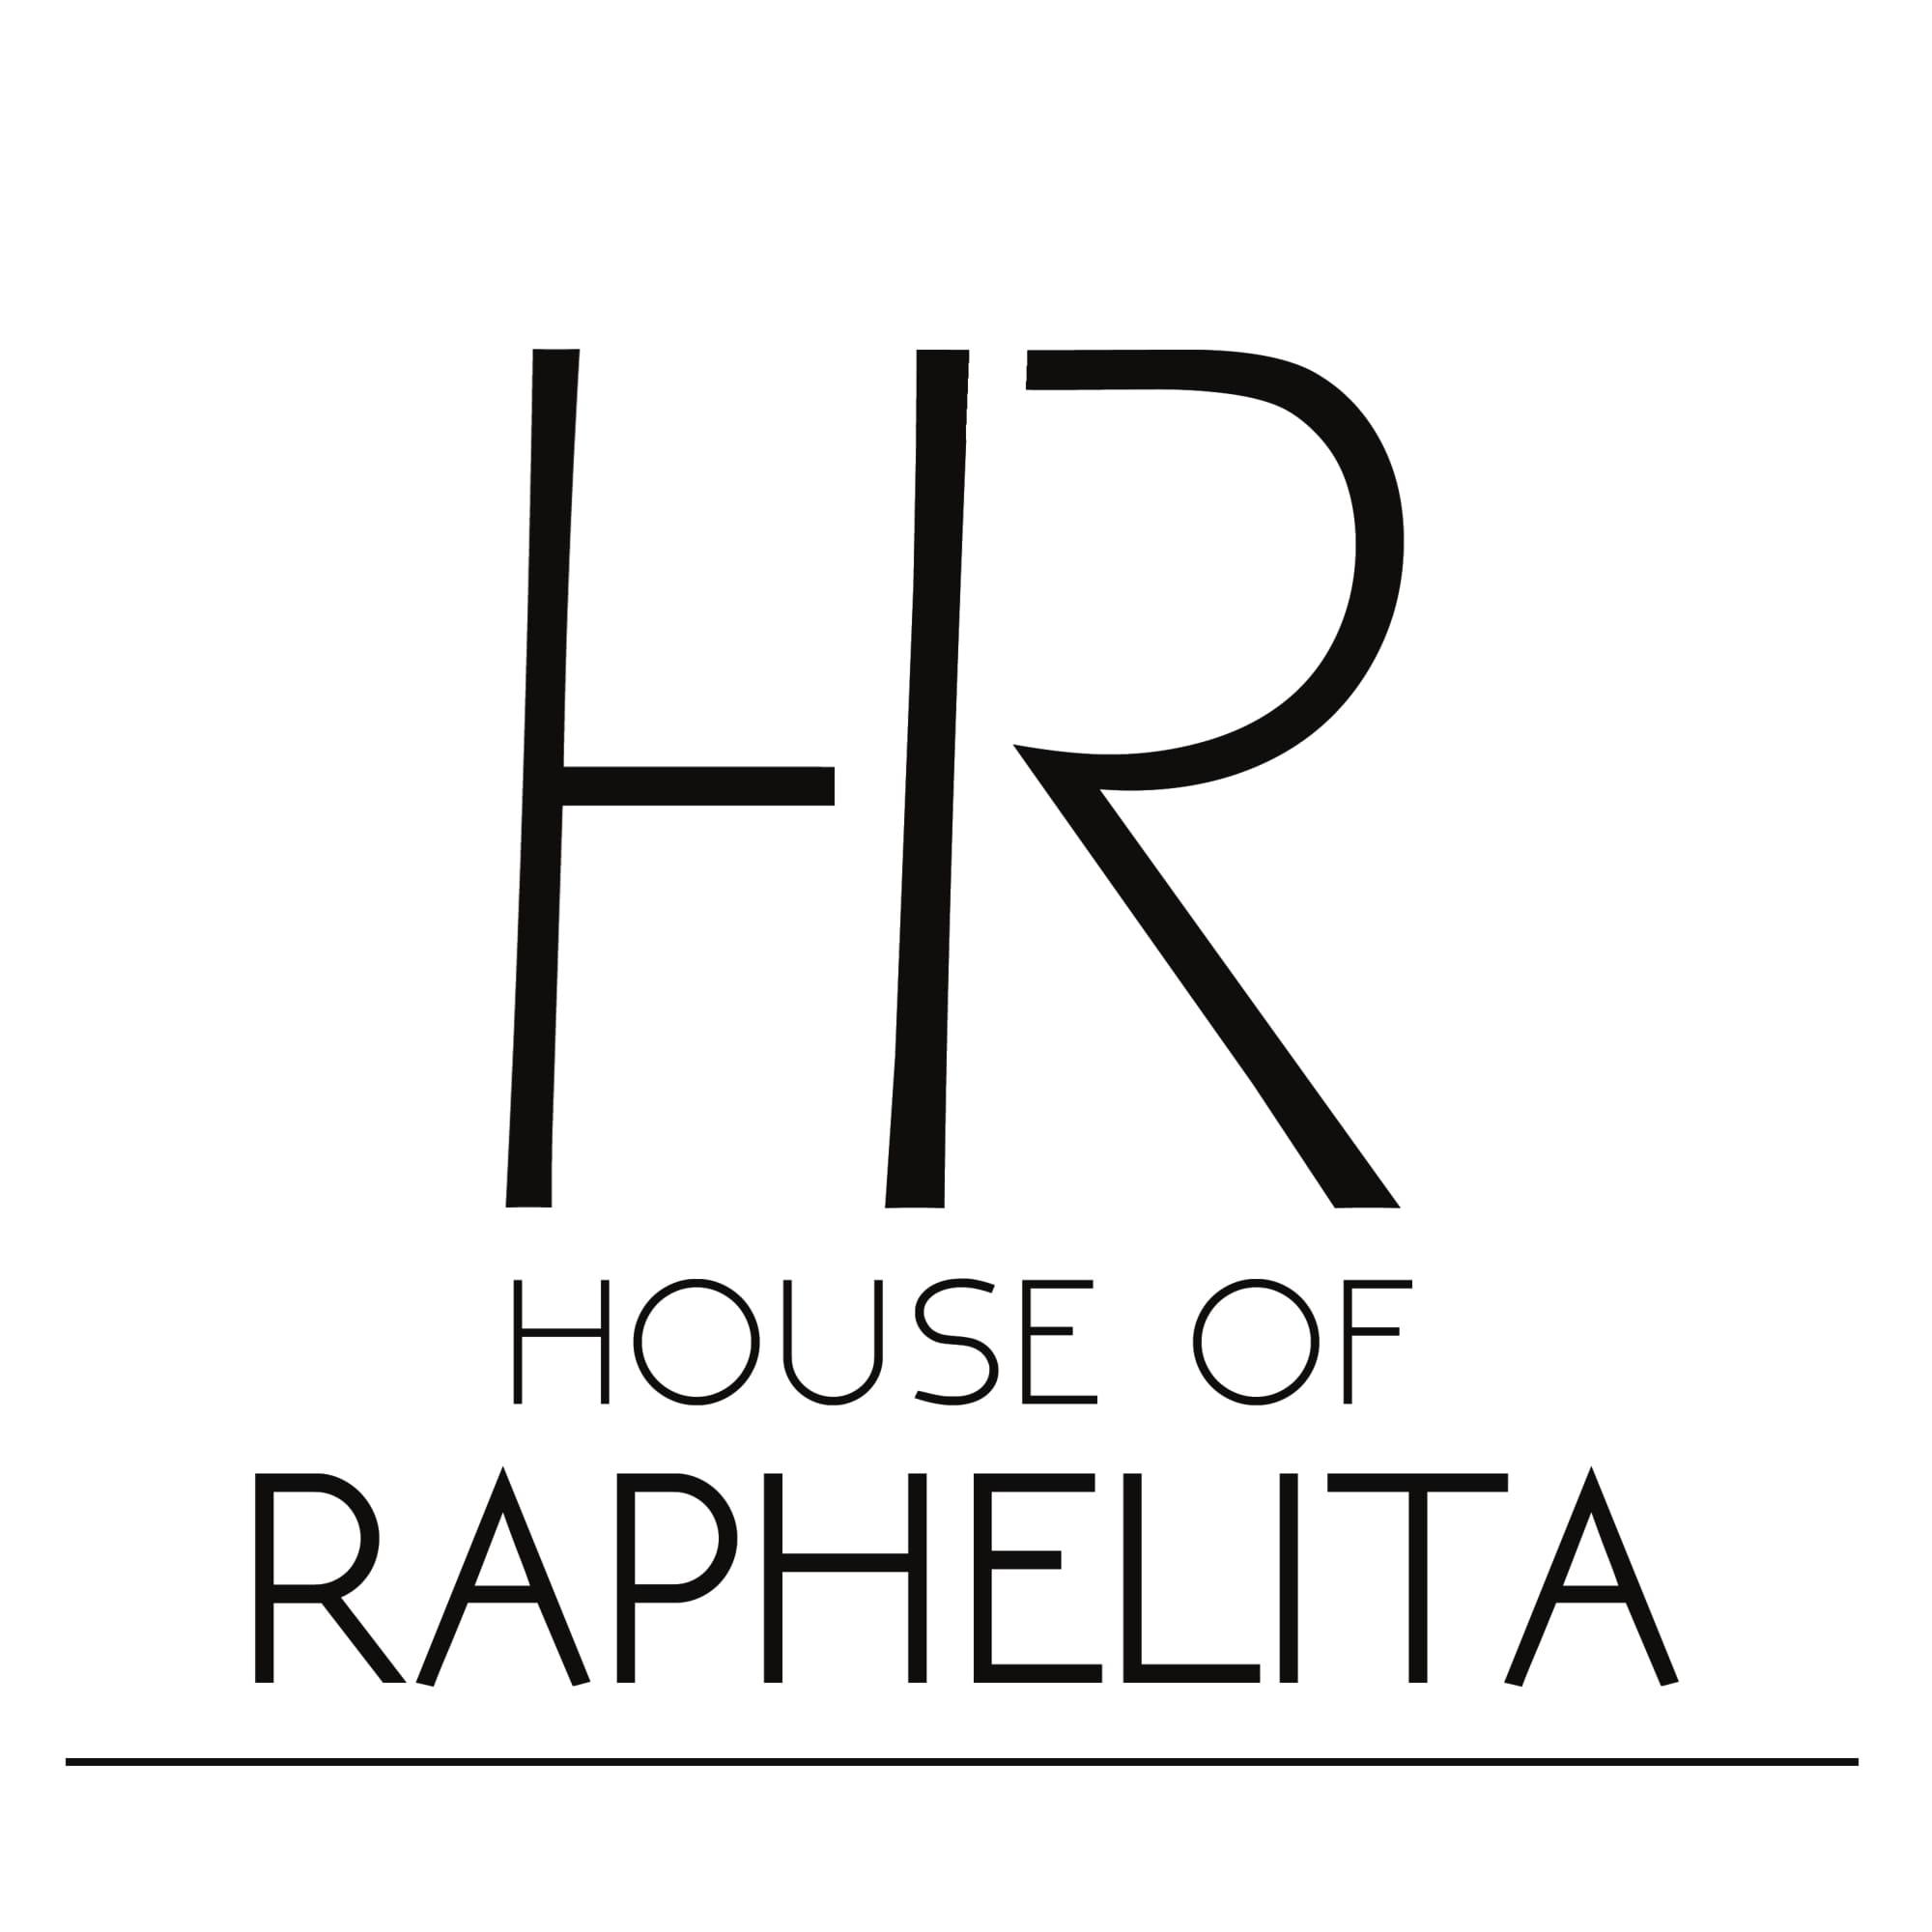 House of Raphelita Logo 2015 Edge-1.jpg